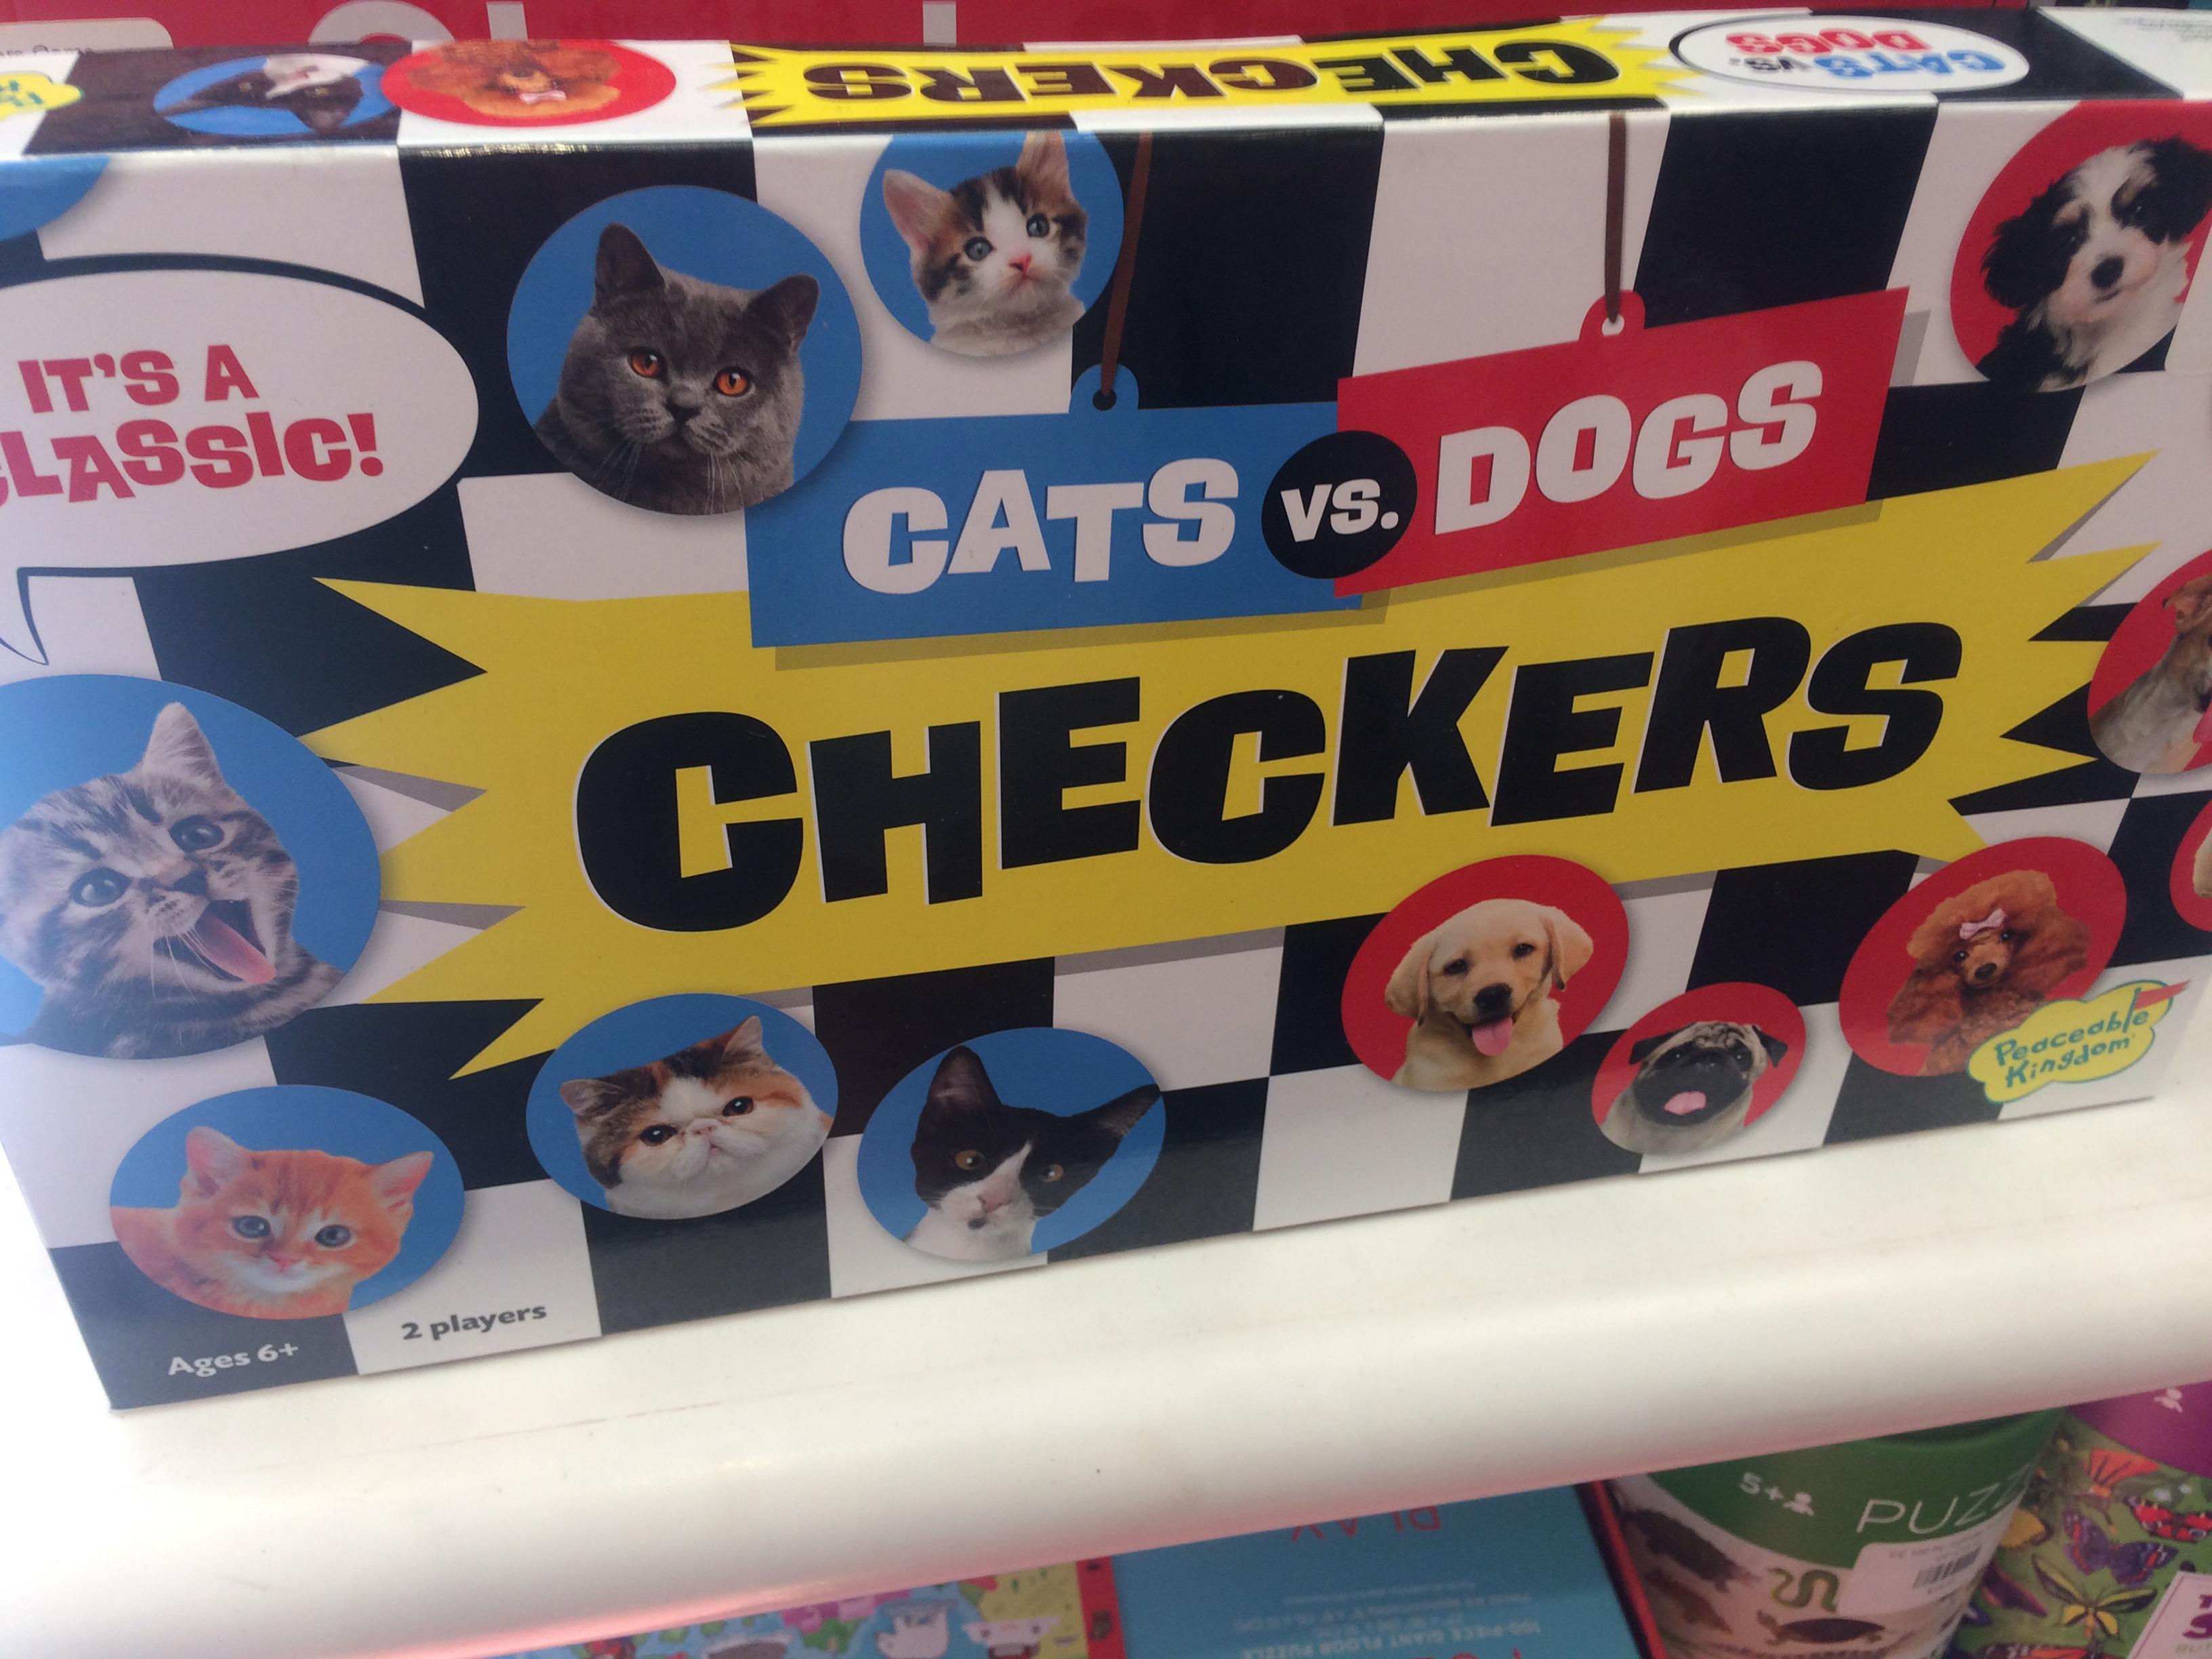 CatsDogsCheckers